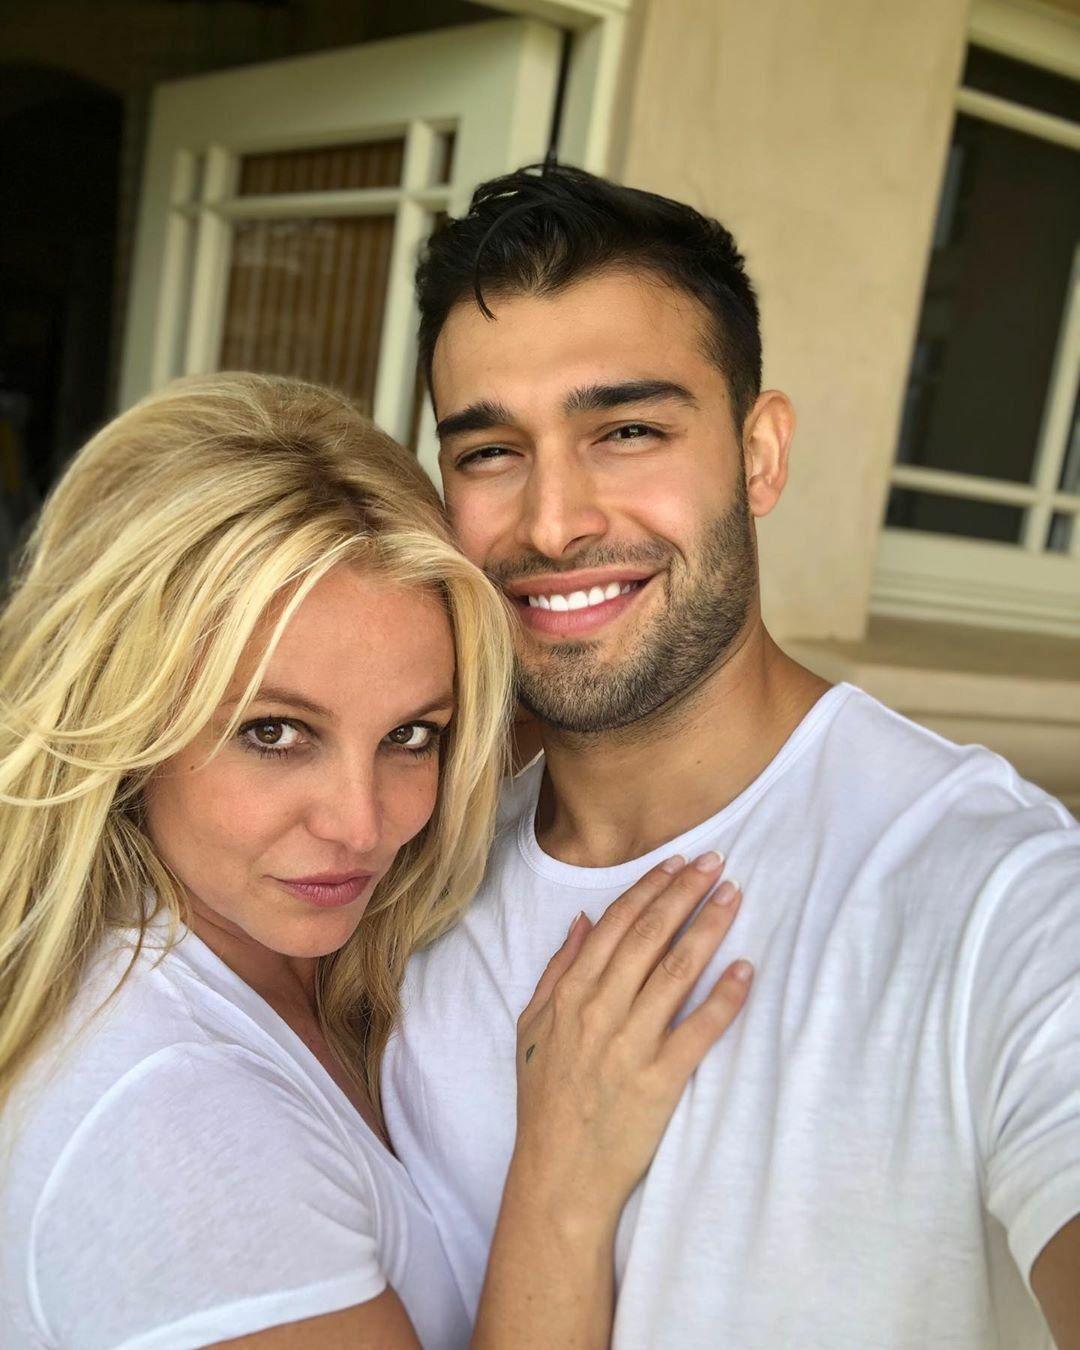 Britney Spears and Sam selfie